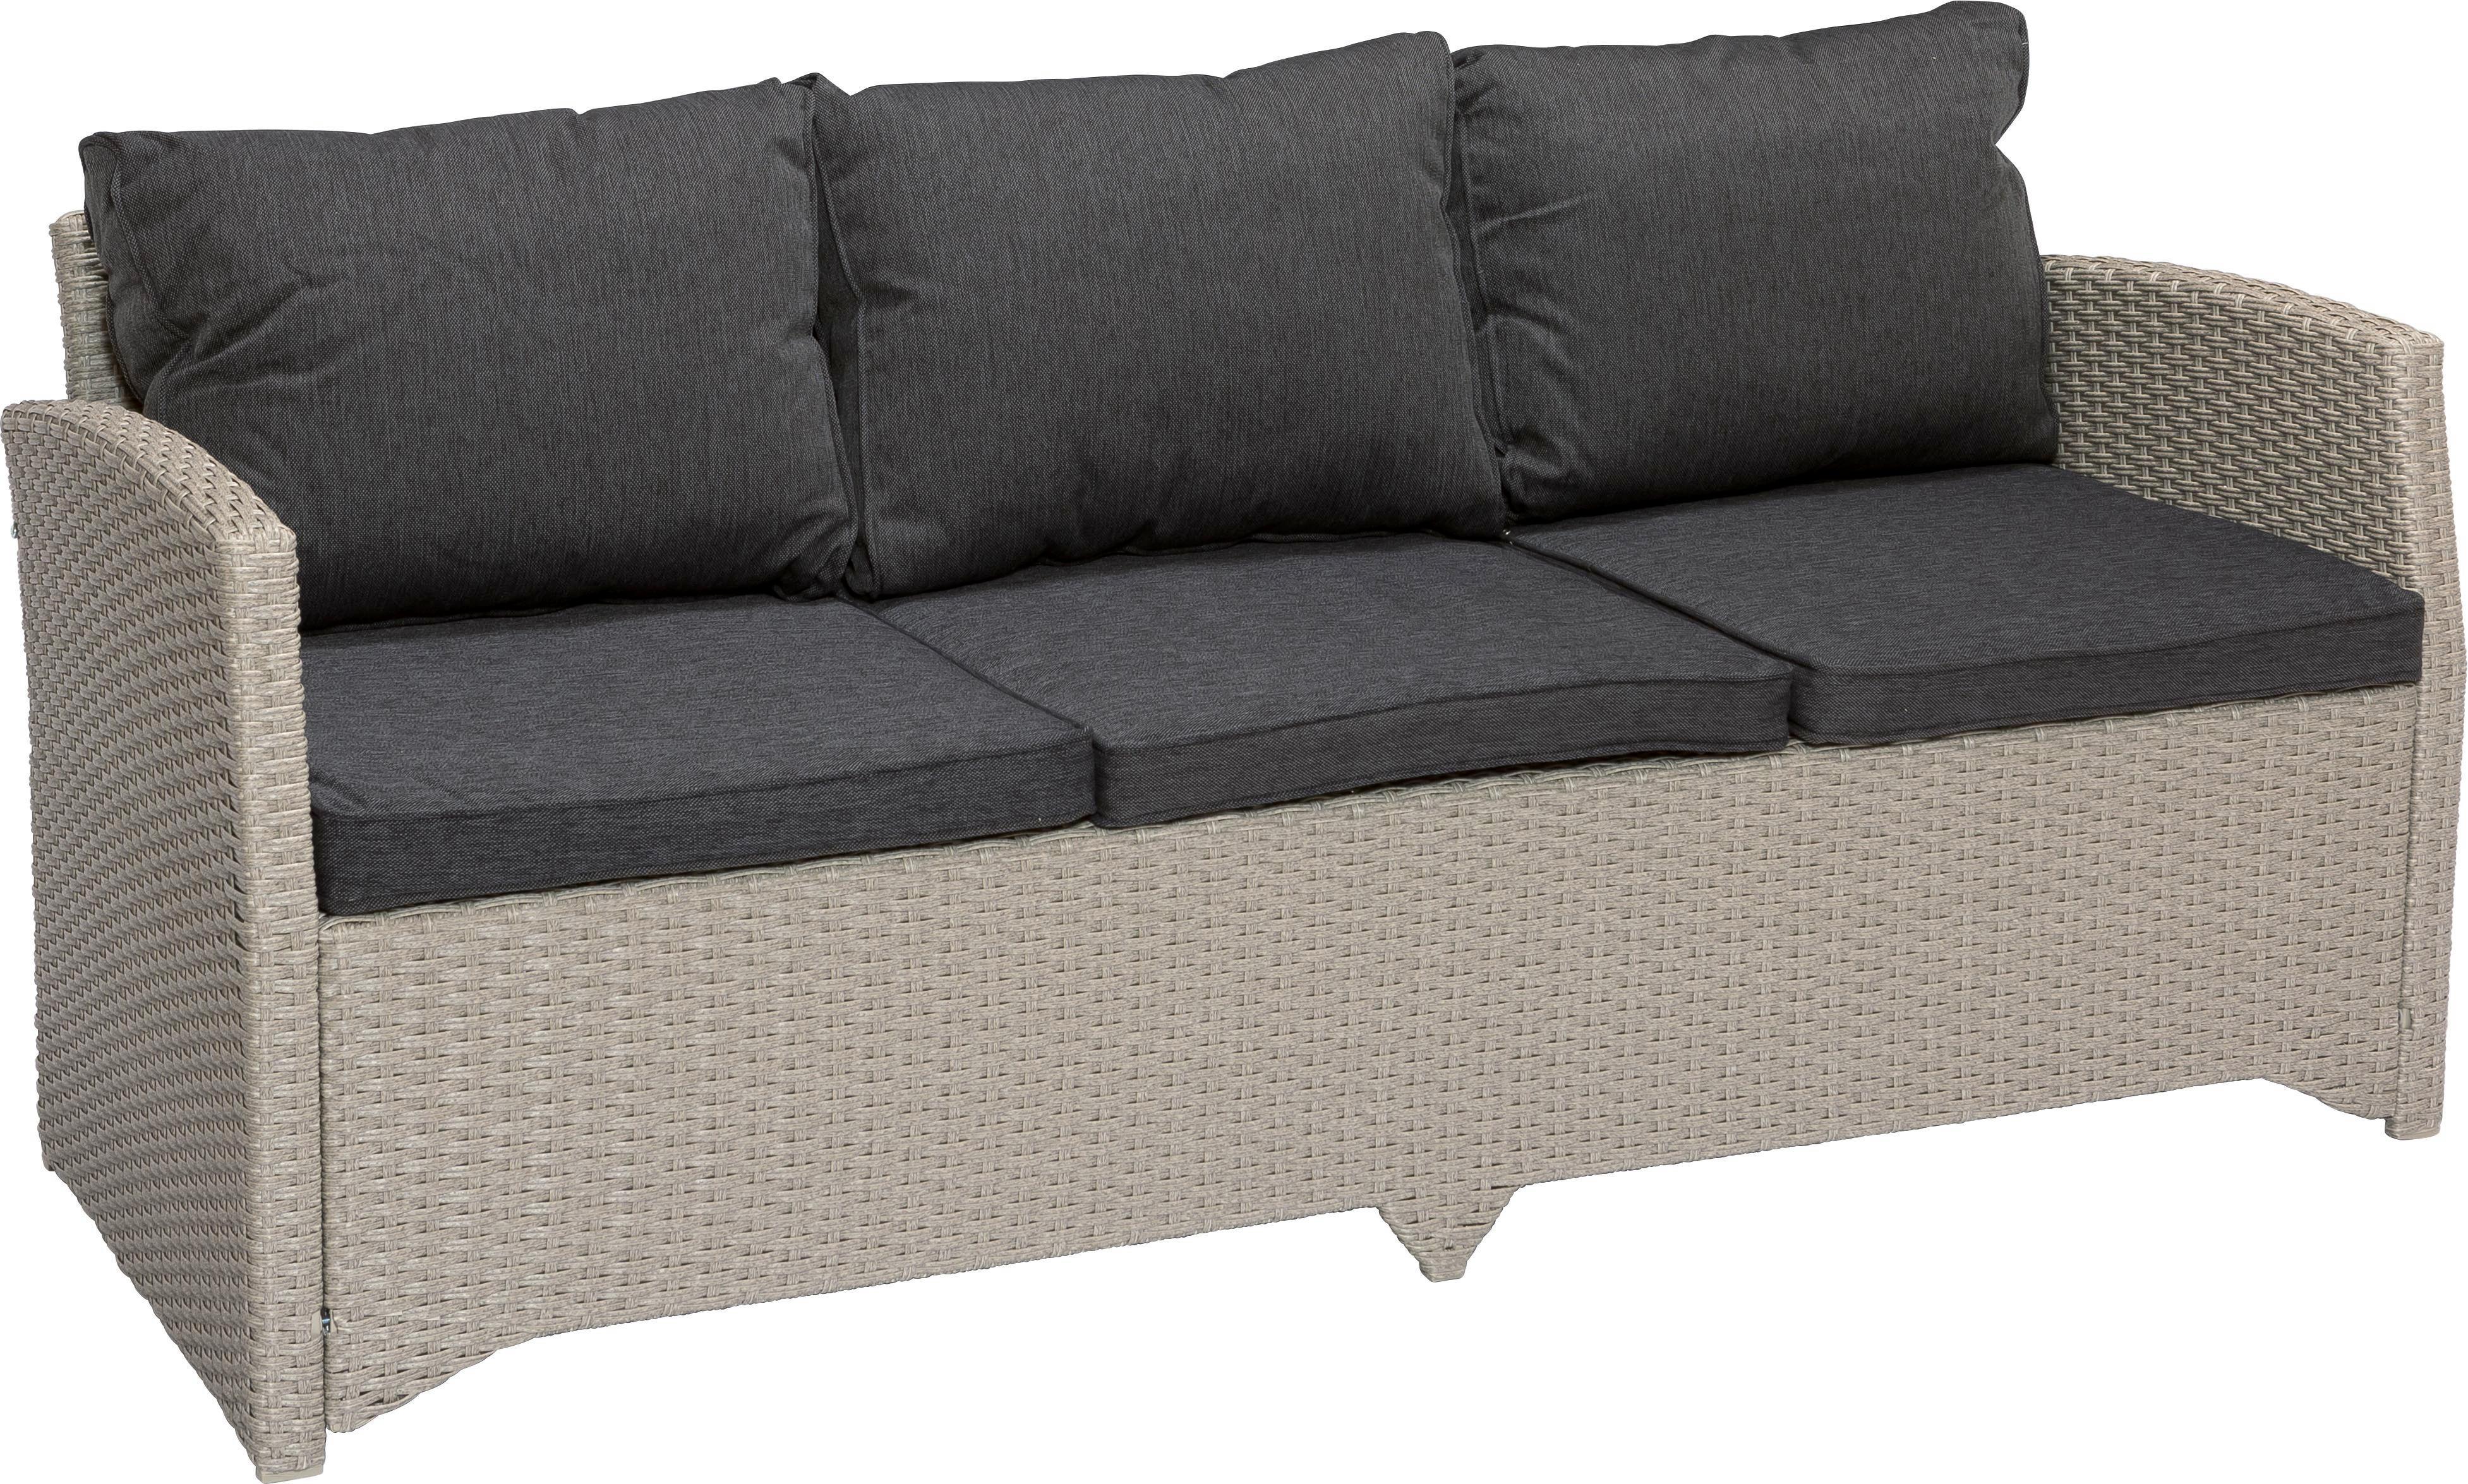 sofa grau m belix sofa f e edelstahl yct projekte. Black Bedroom Furniture Sets. Home Design Ideas